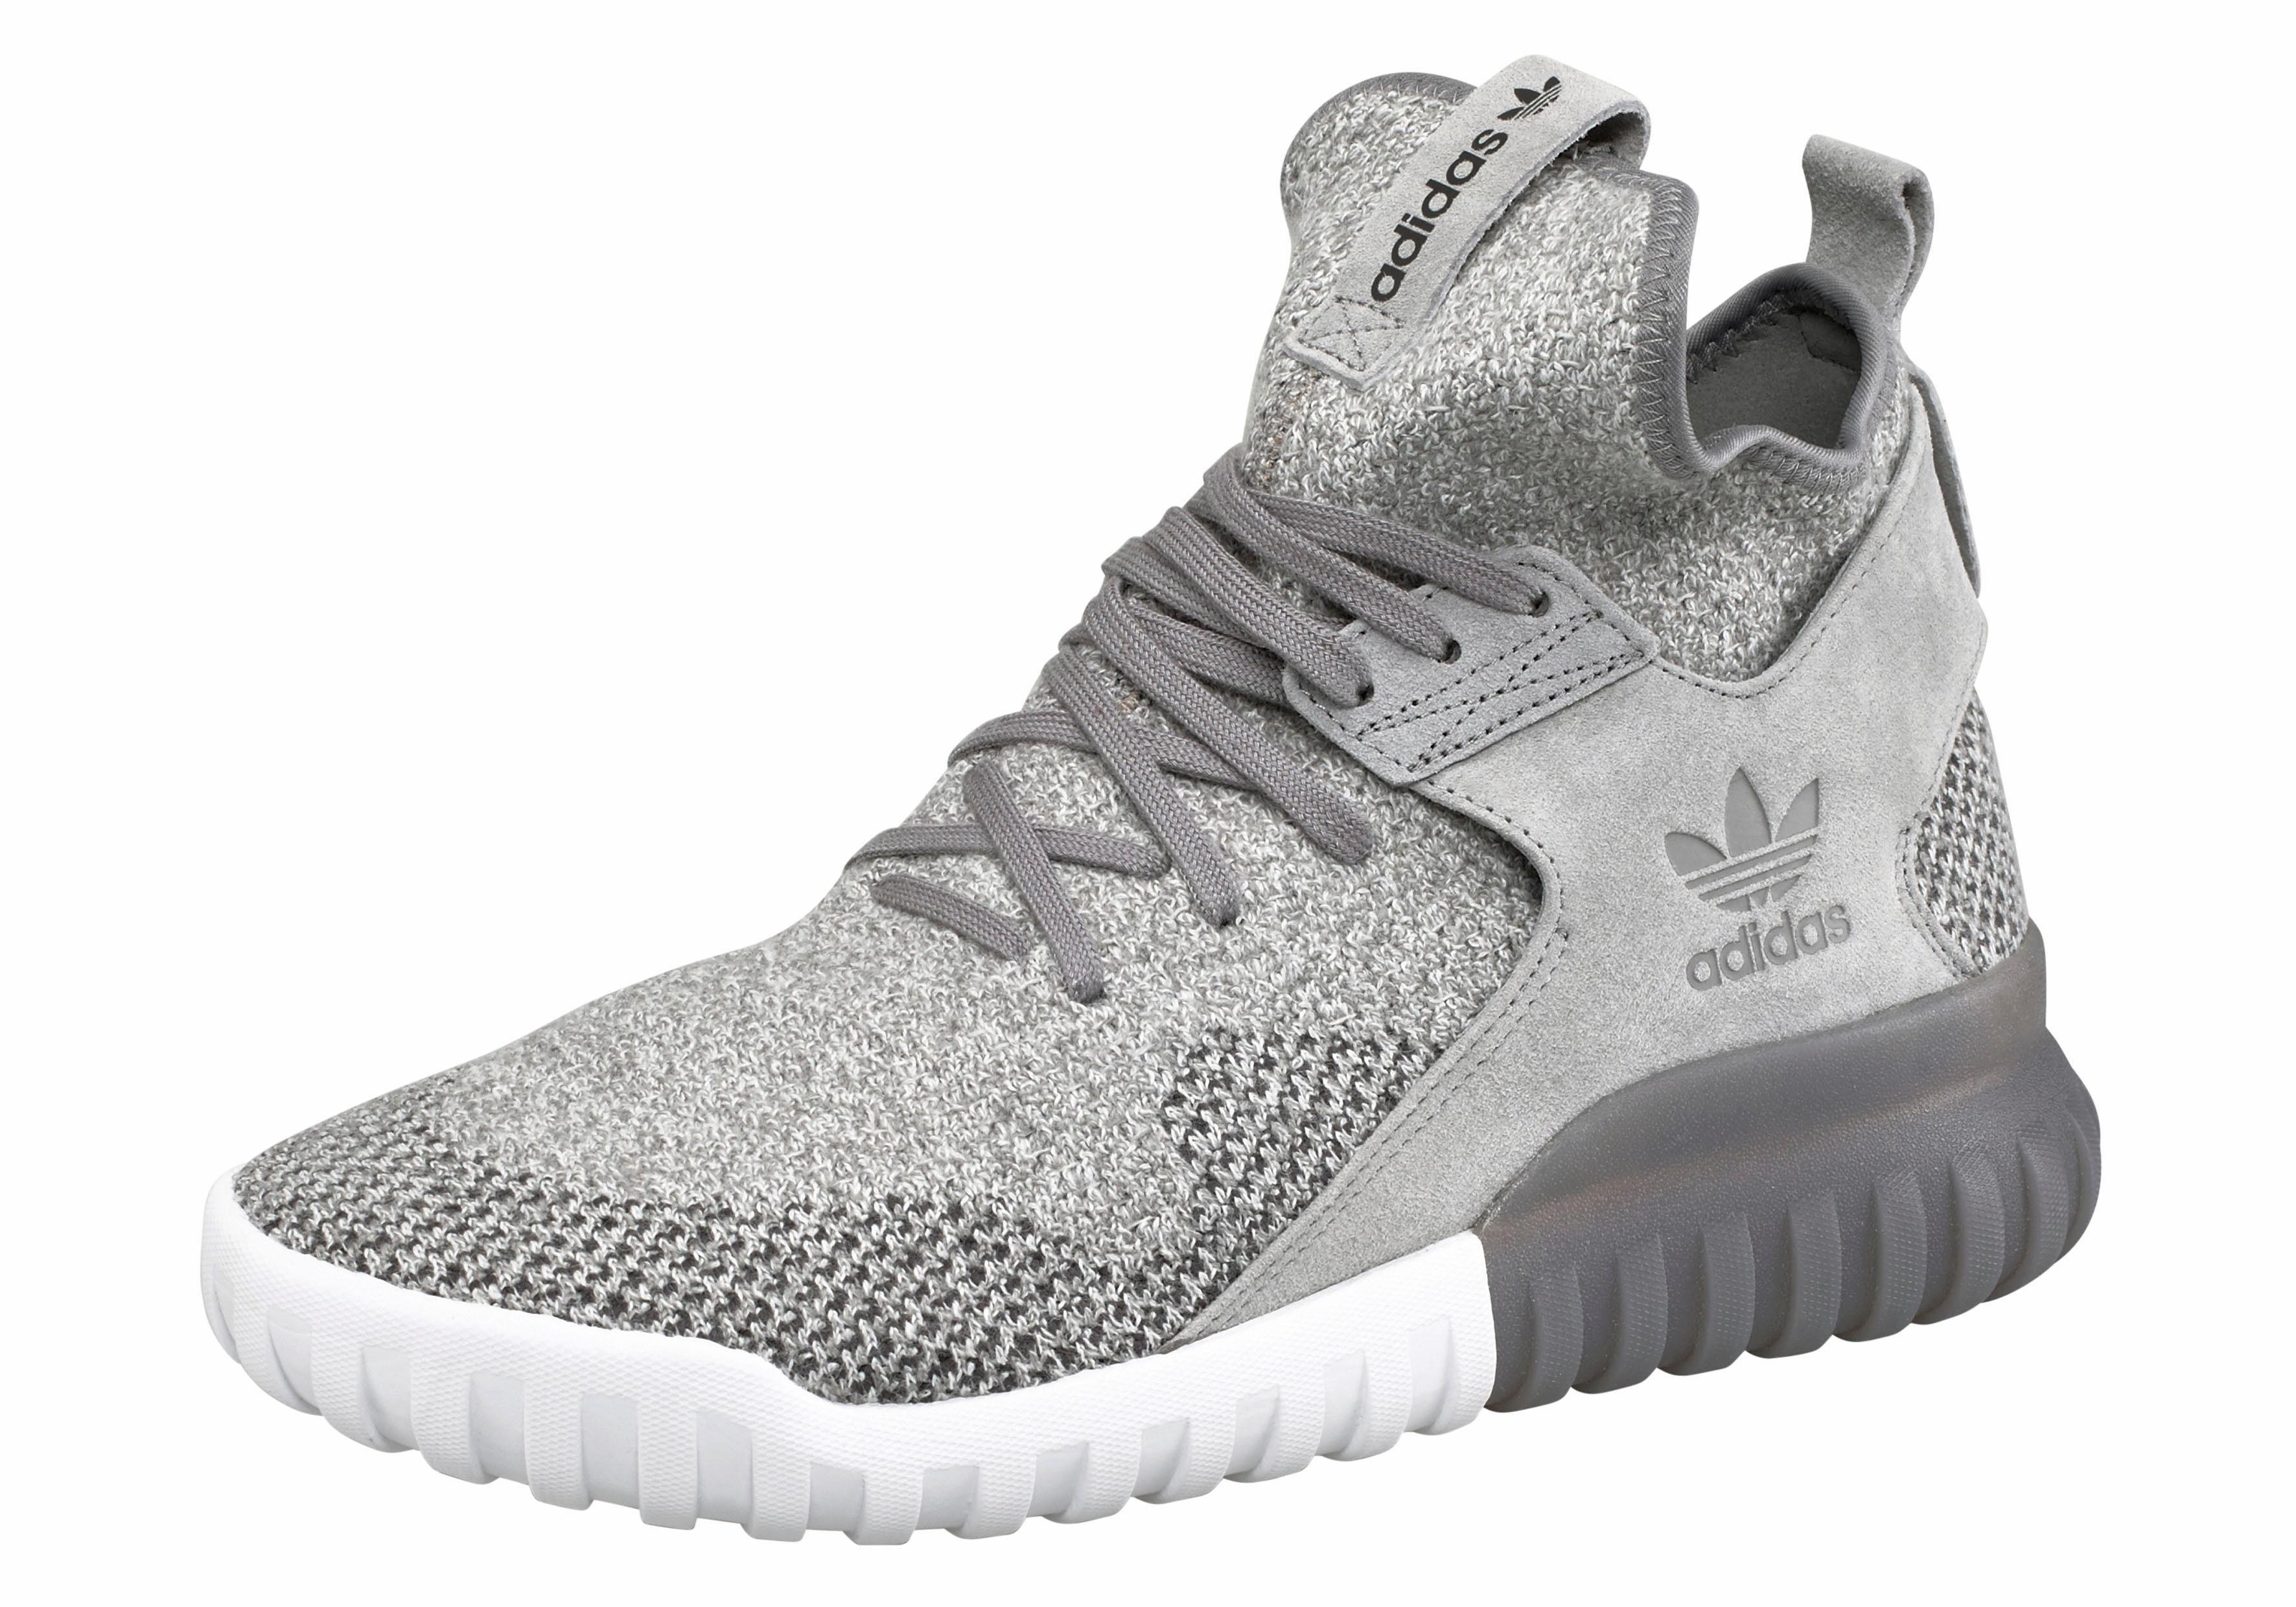 adidas originals tubular x pk sneaker schwarz weiss?$formatz$